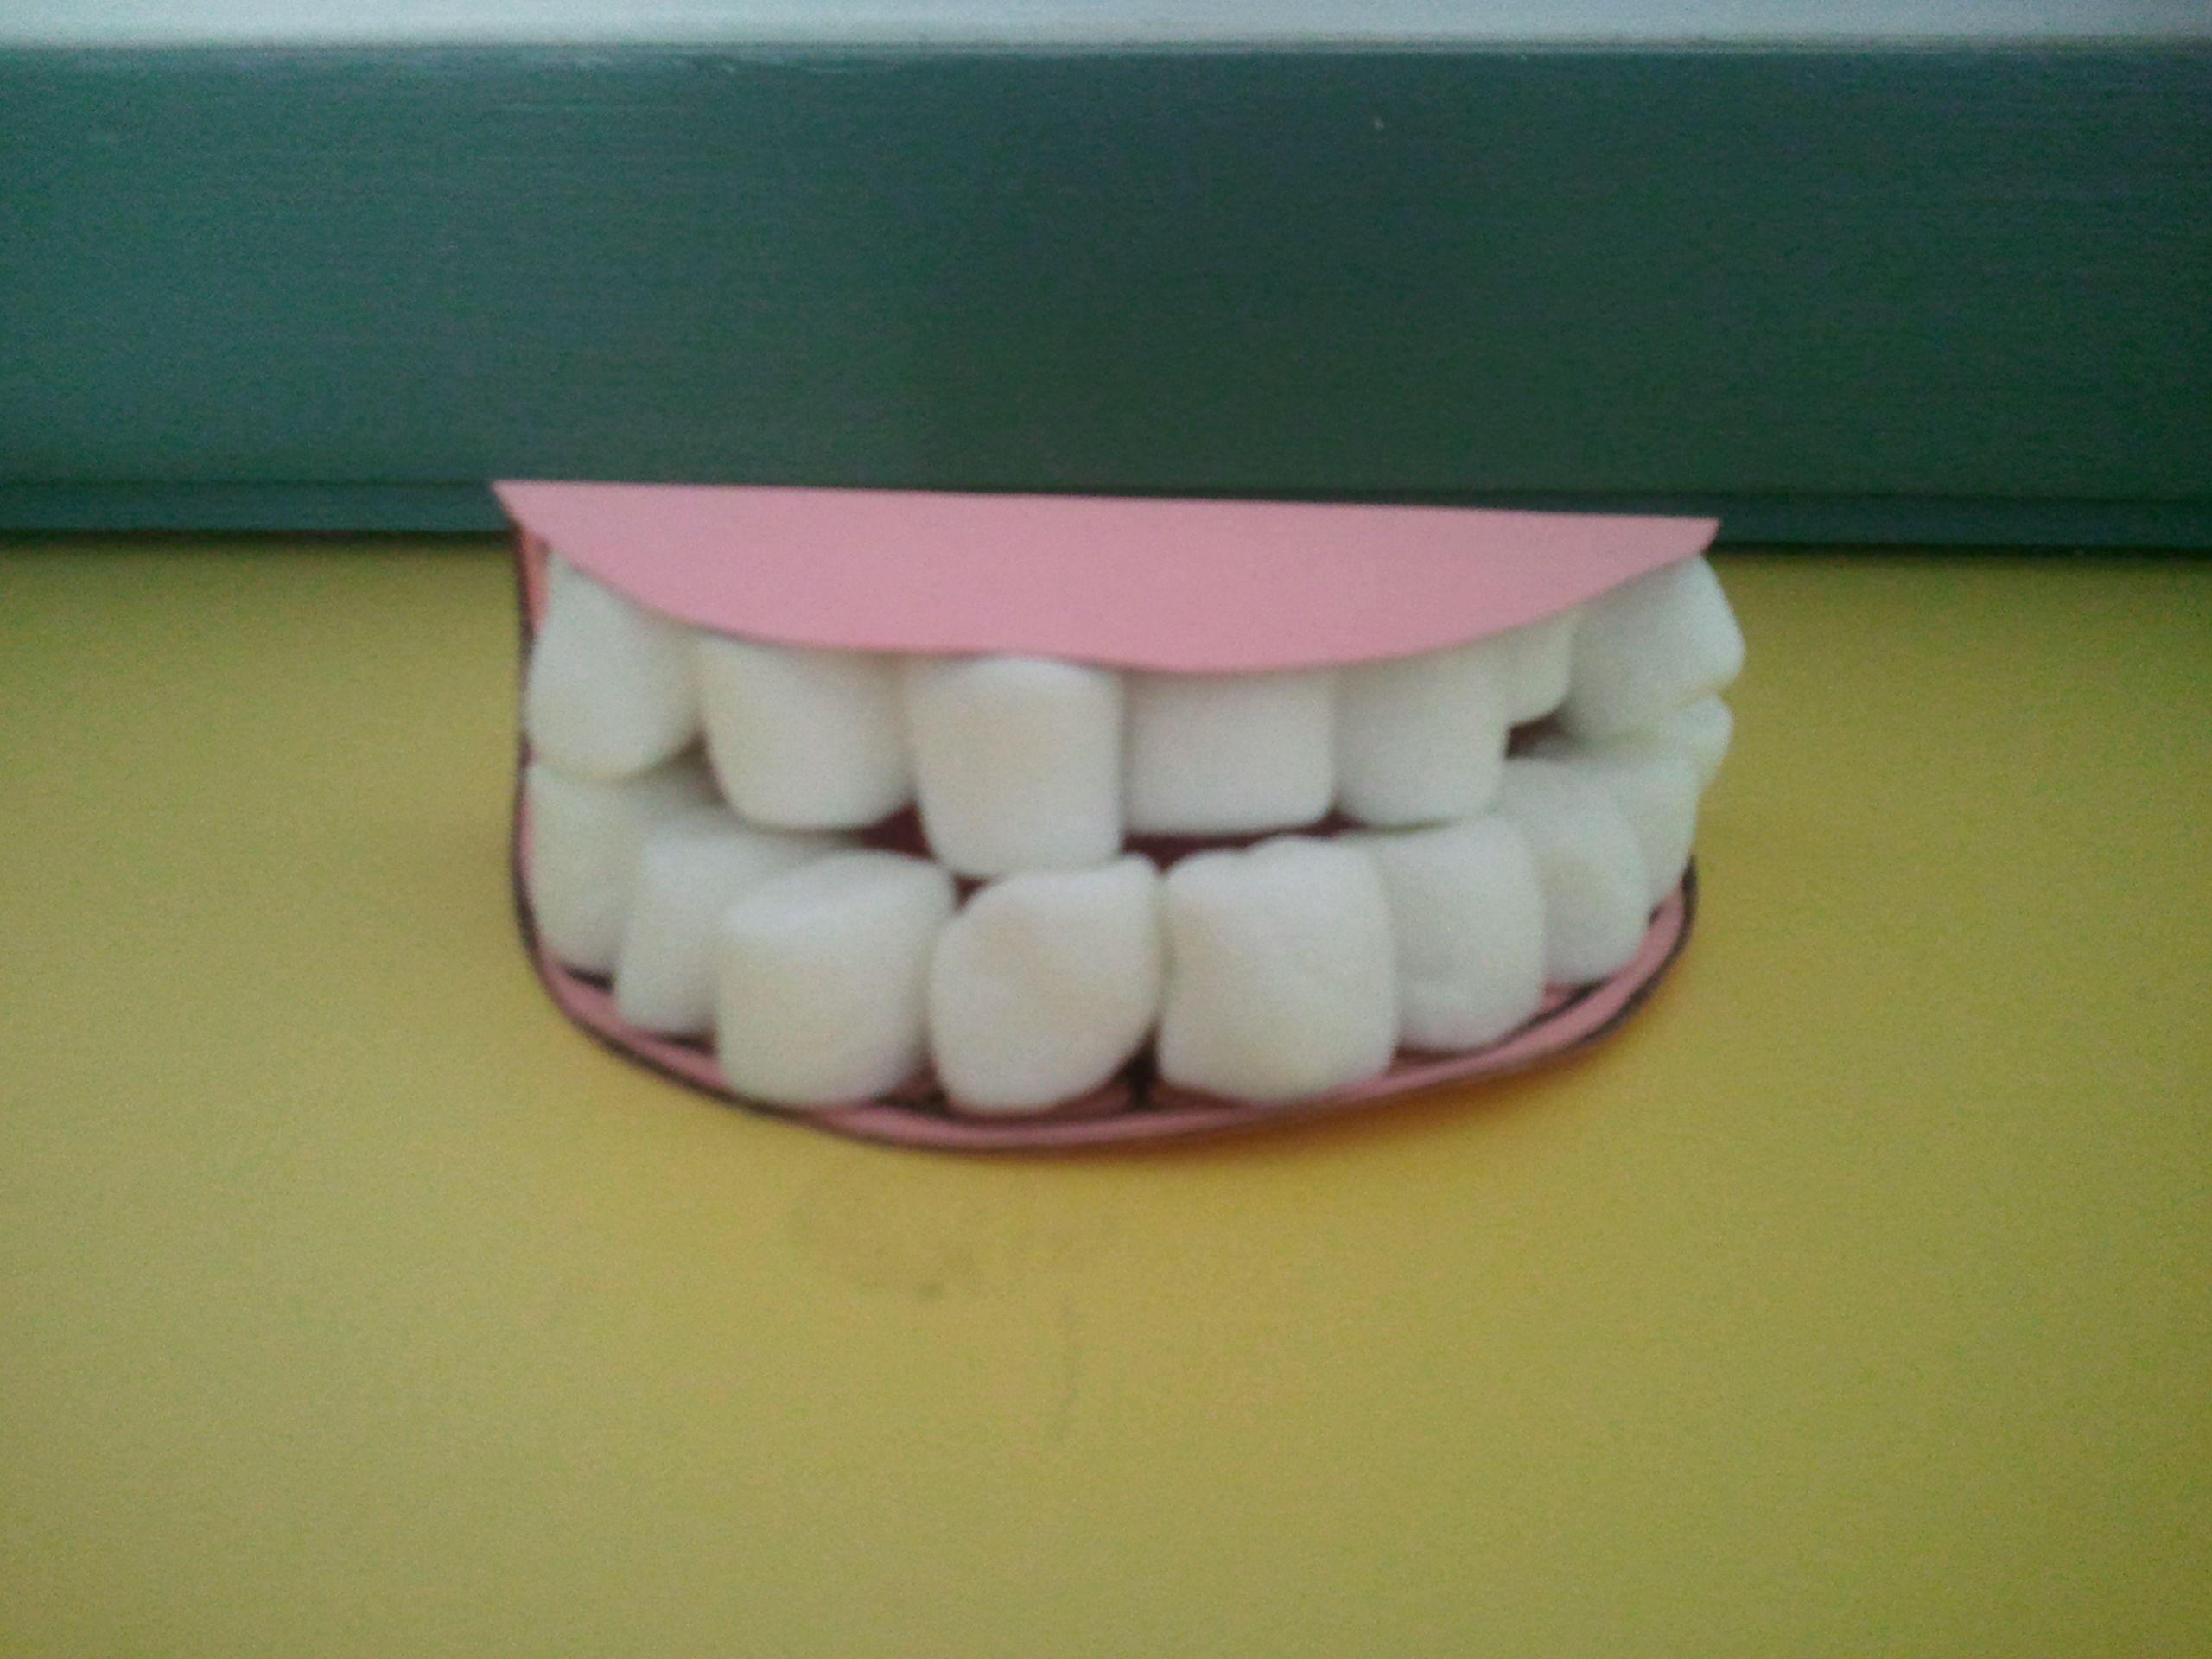 Brush Your Teeth, Mr. President | Dental health, Dental and Teeth